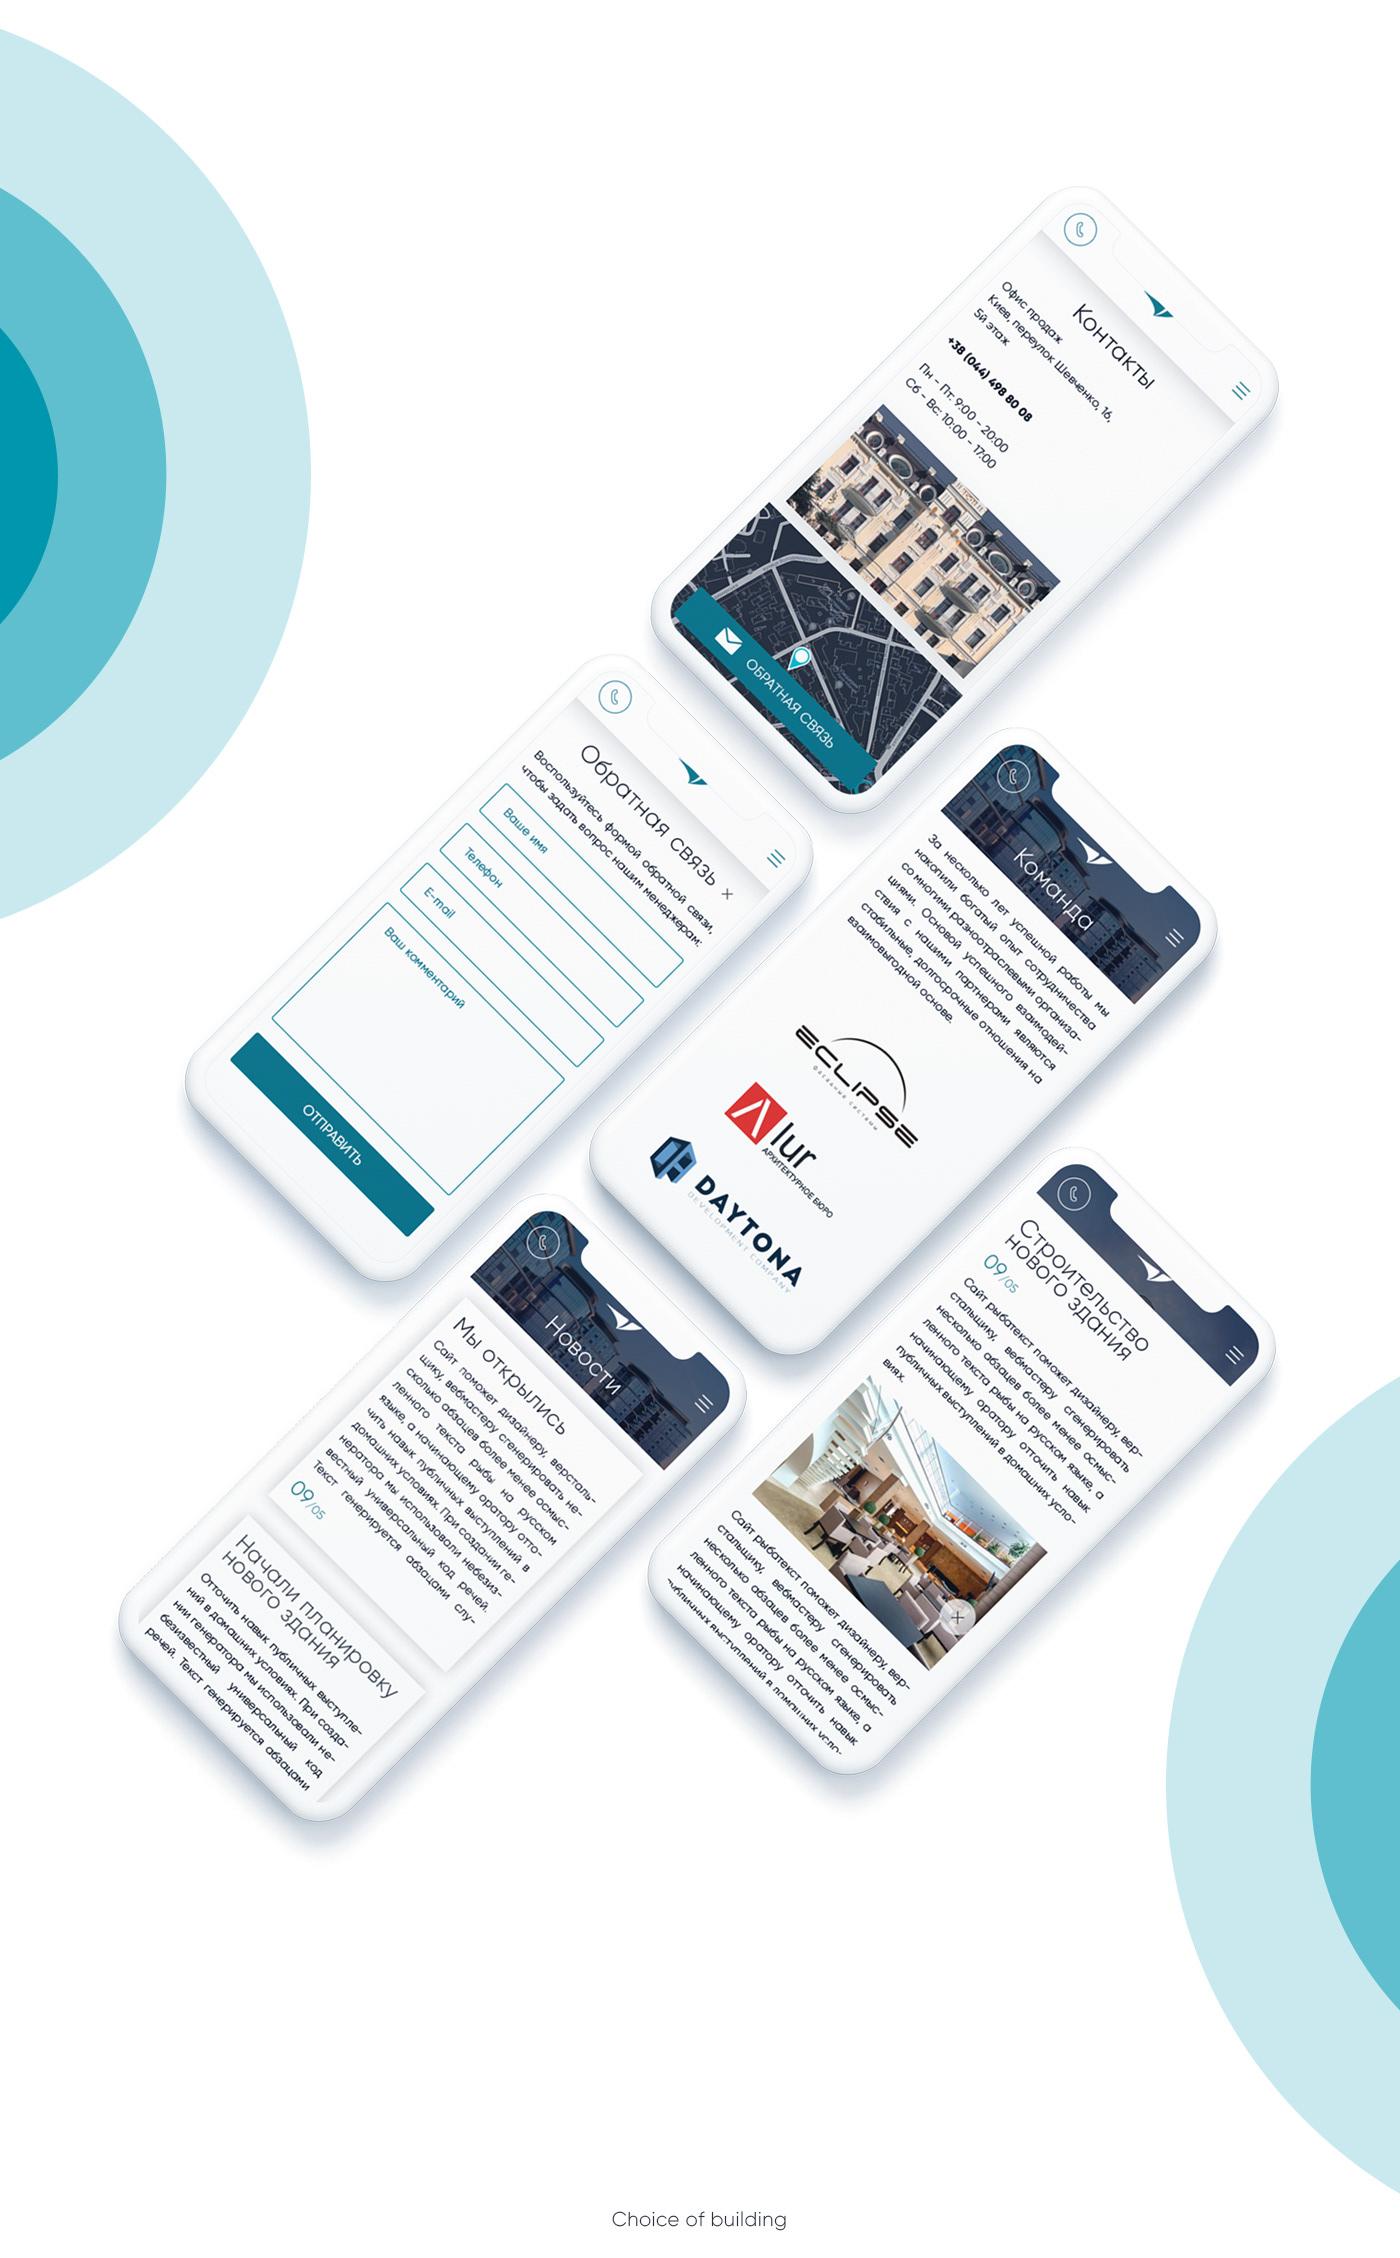 Responsive design Website UI ux mobile building shop free